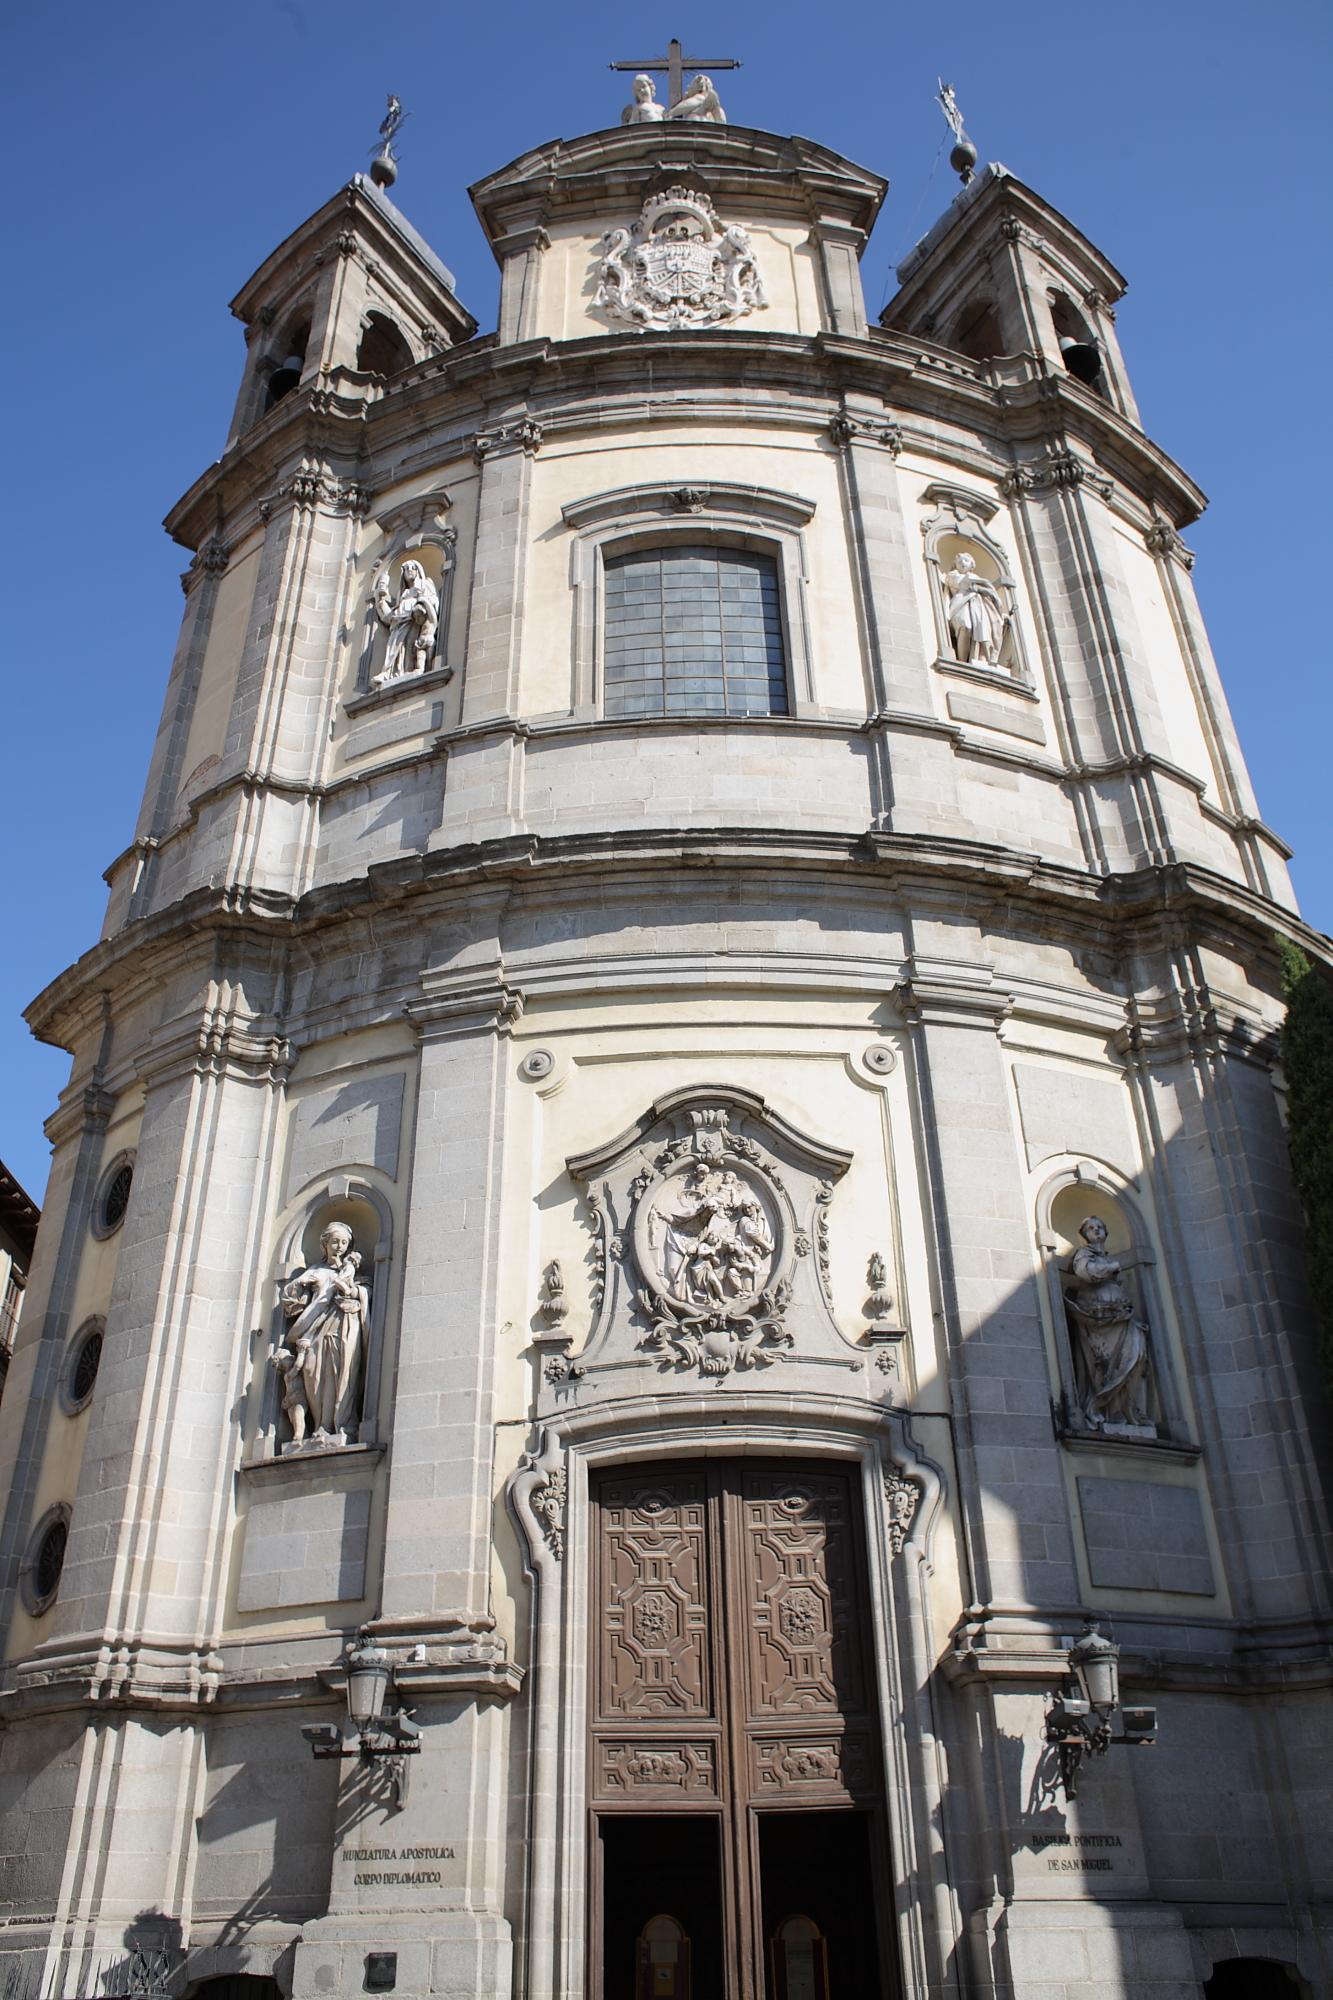 File:Iglesia Pontificia de San Miguel Madrid.jpg - Wikimedia Commons